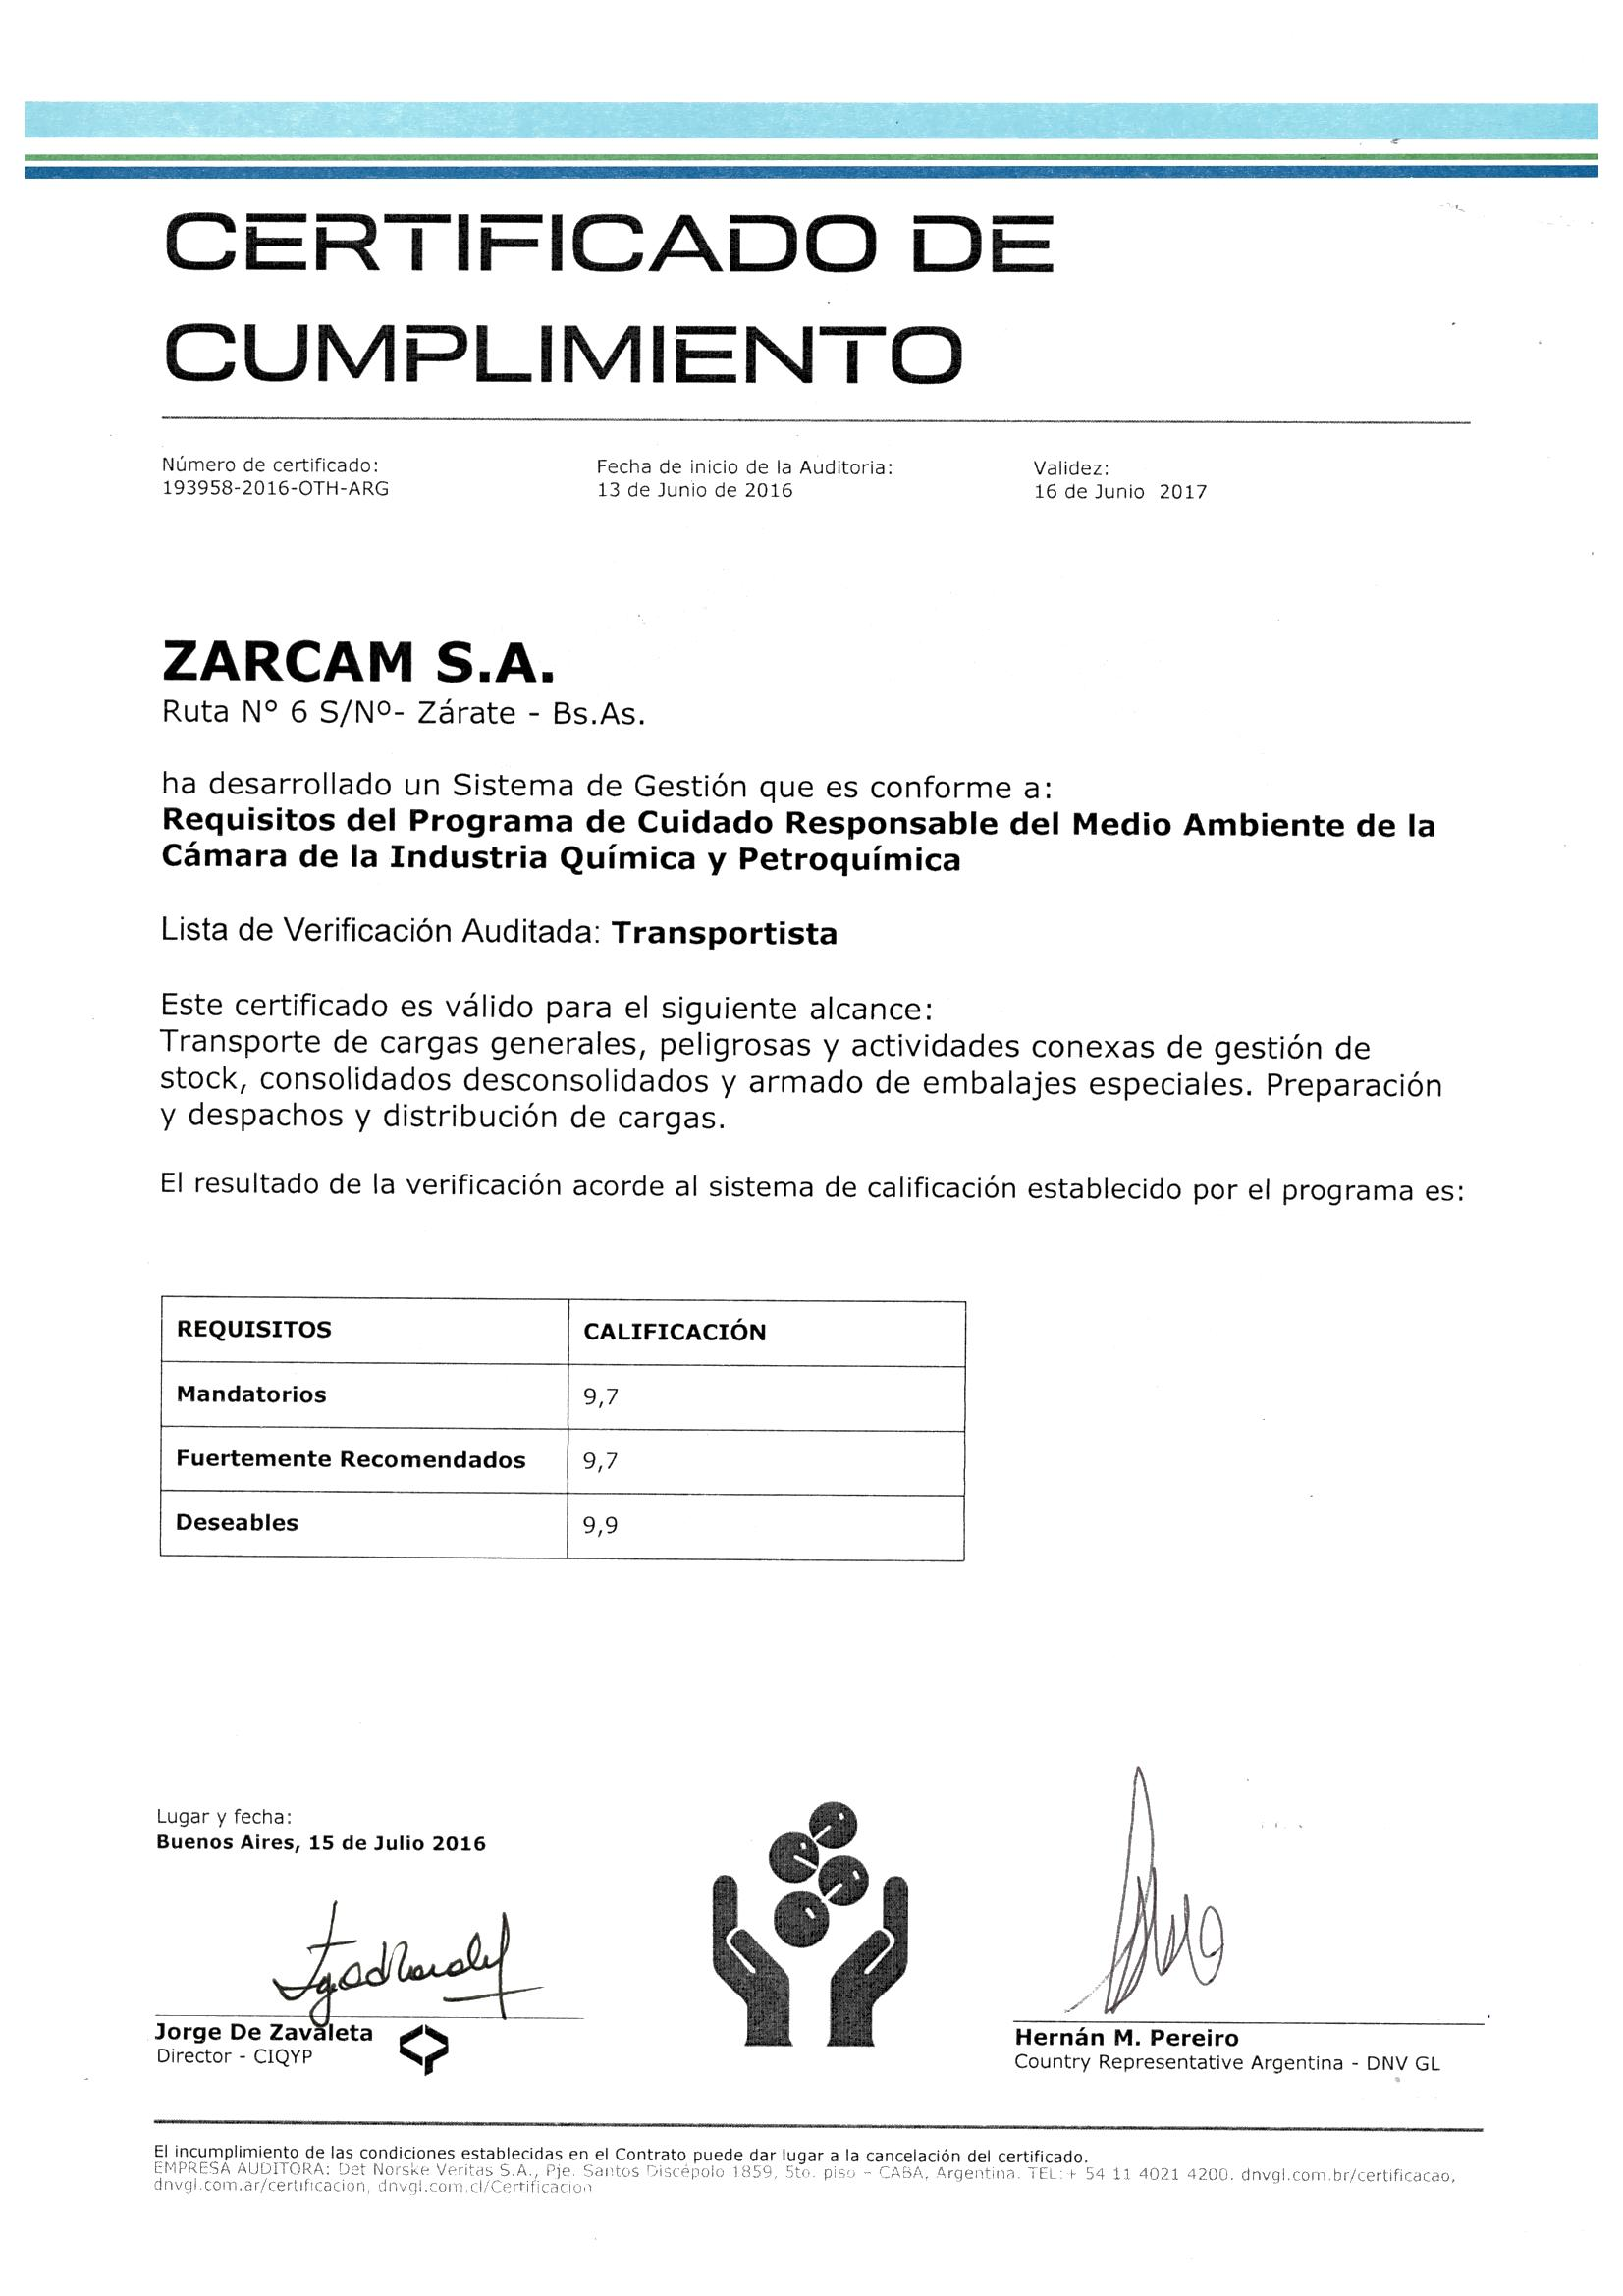 CERTIFICADO-PCRMA-2016-2017.jpg